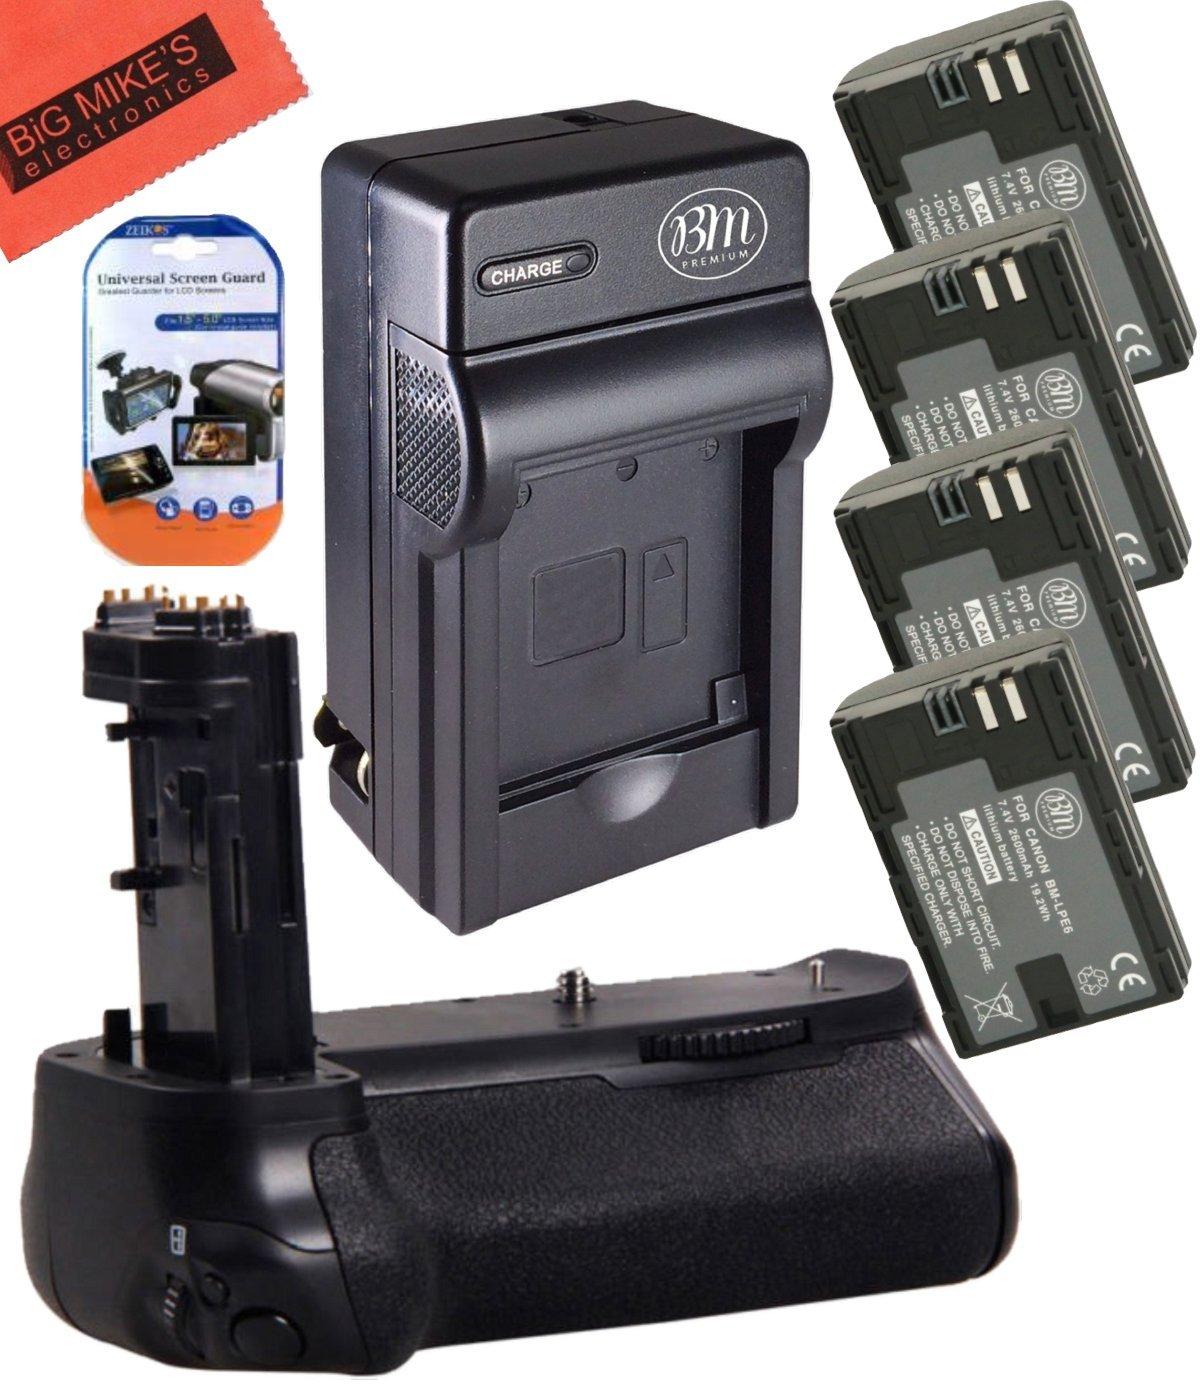 Battery Grip Kit for Canon EOS 7D Mark II Digital SLR Camera Includes Qty 4 BM Premium LP-E6, LP-E6N Batteries + Battery Charger + Replacement BG-E16 Battery Grip